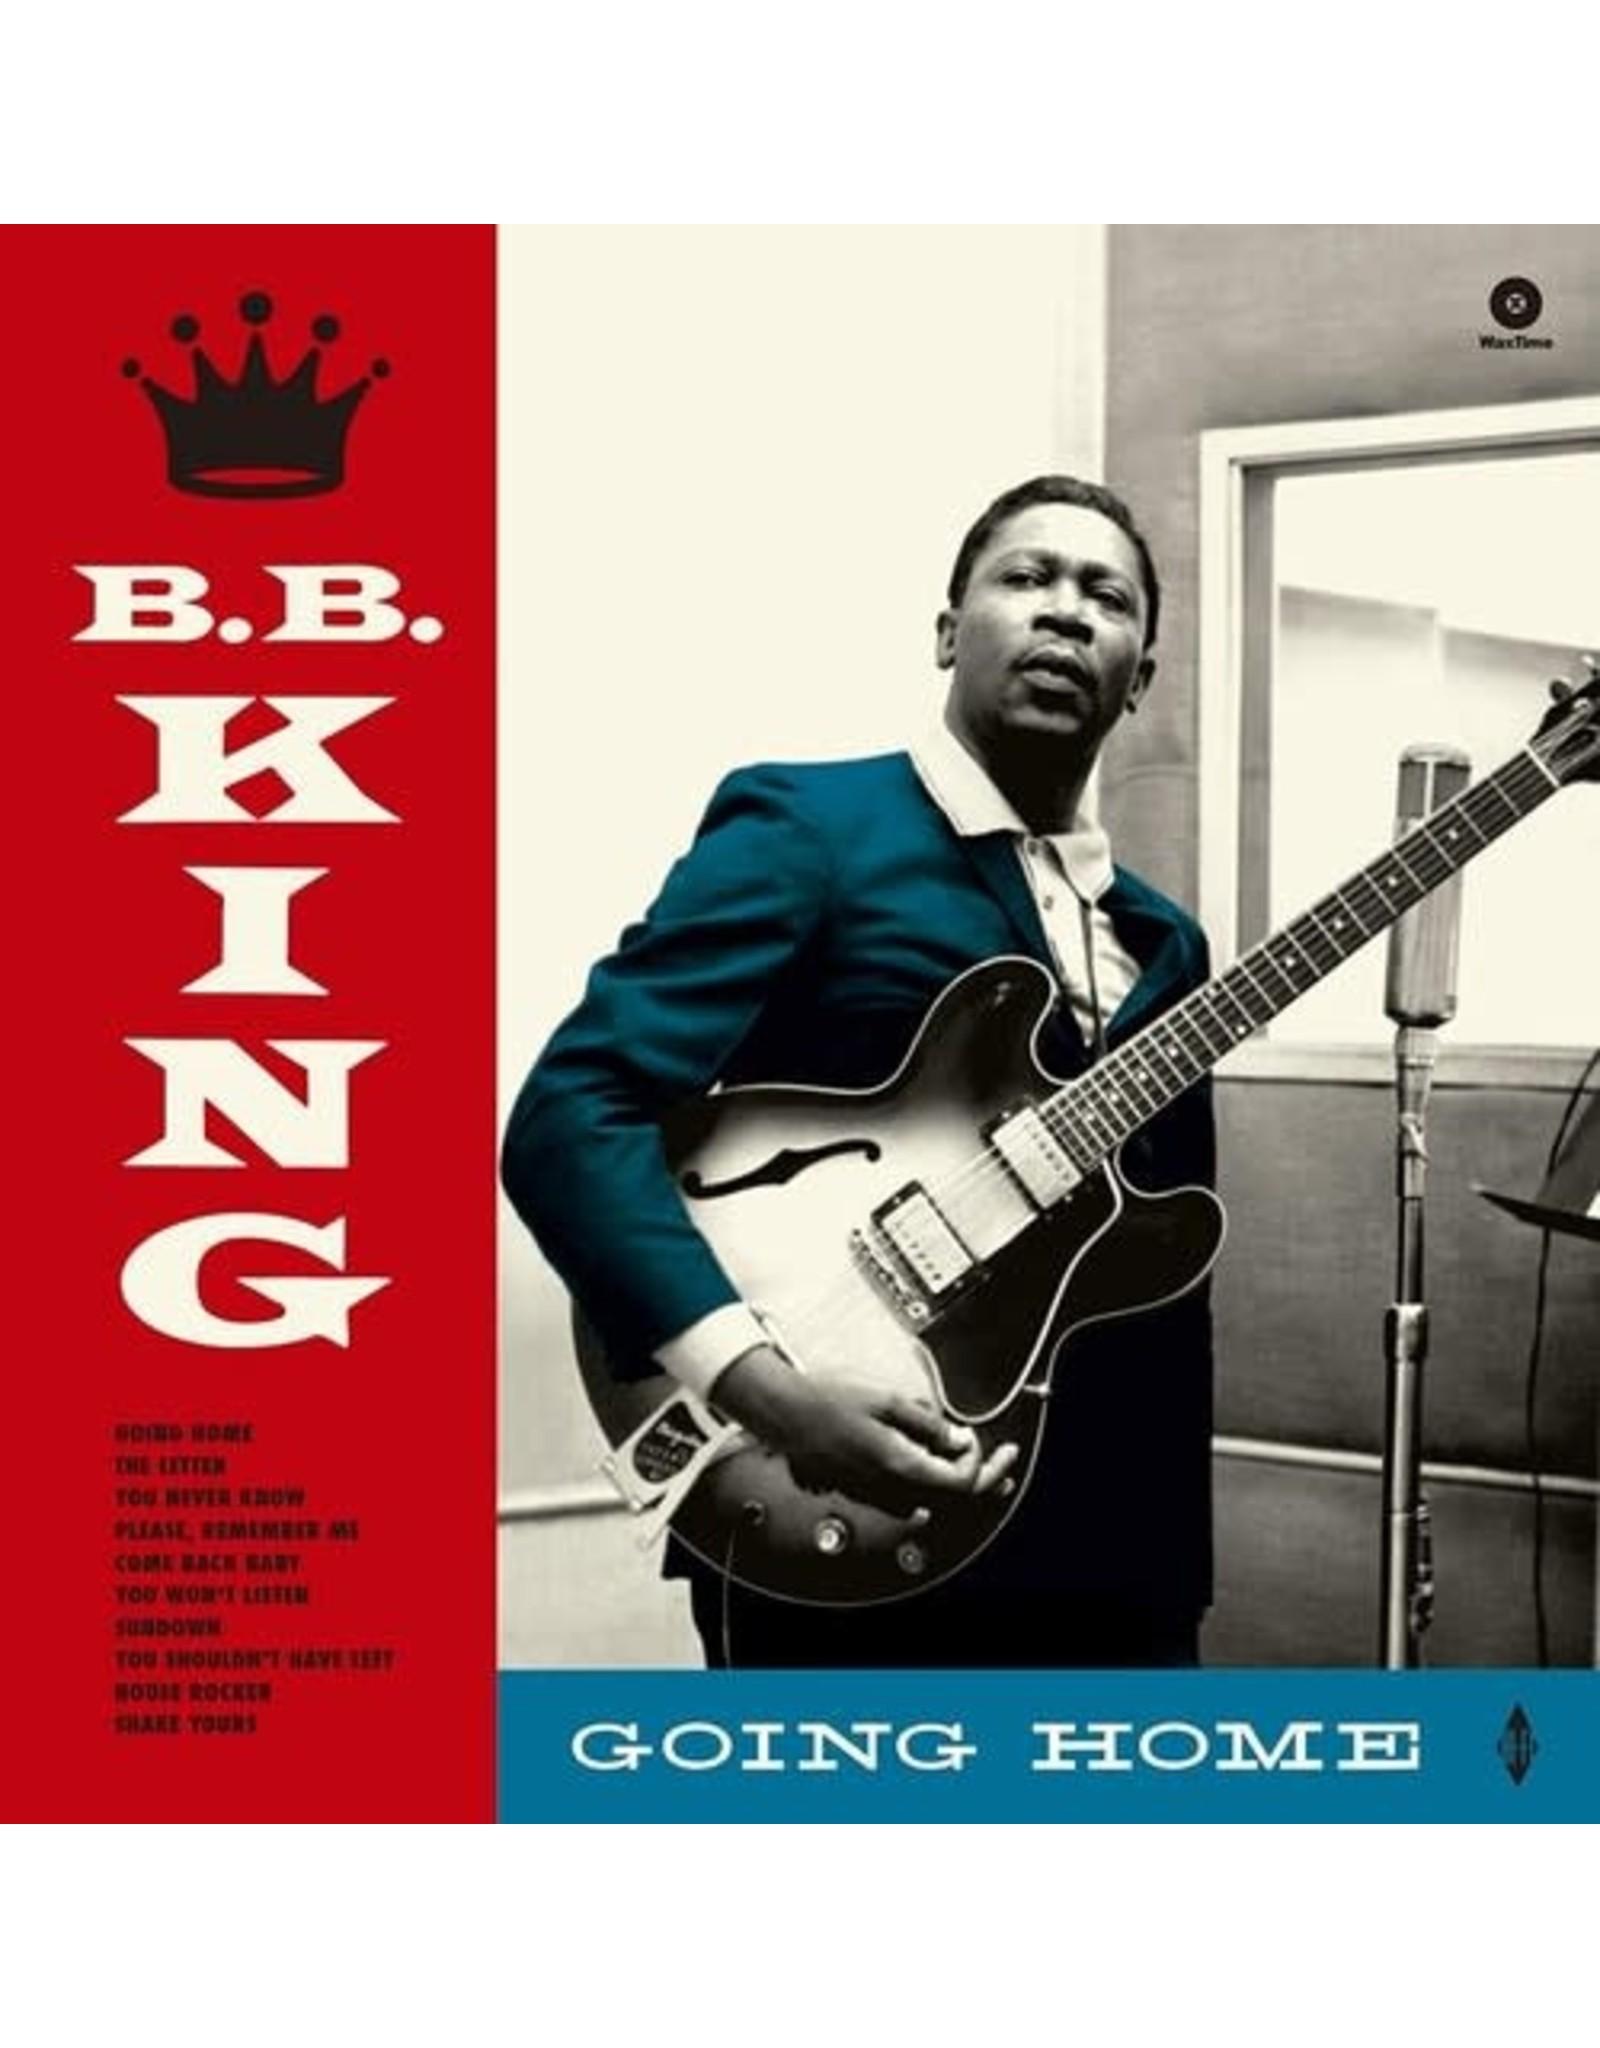 New Vinyl B.B. King - Going Home LP